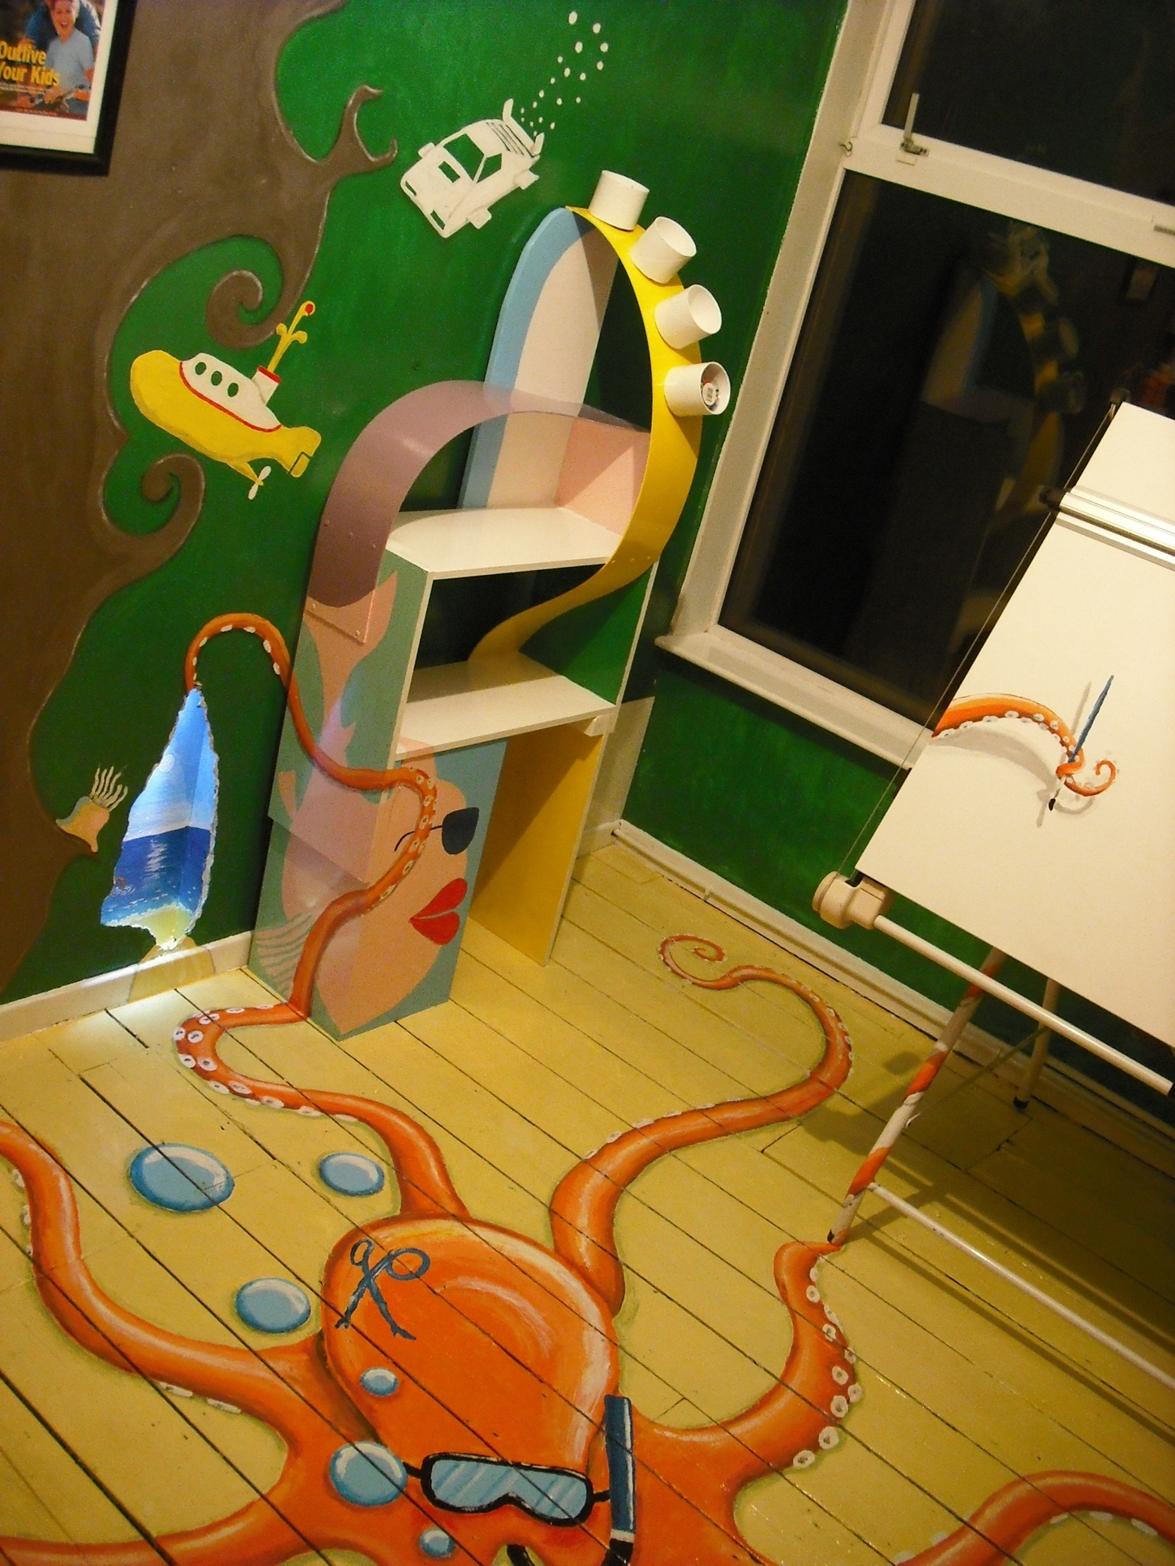 Octopus room